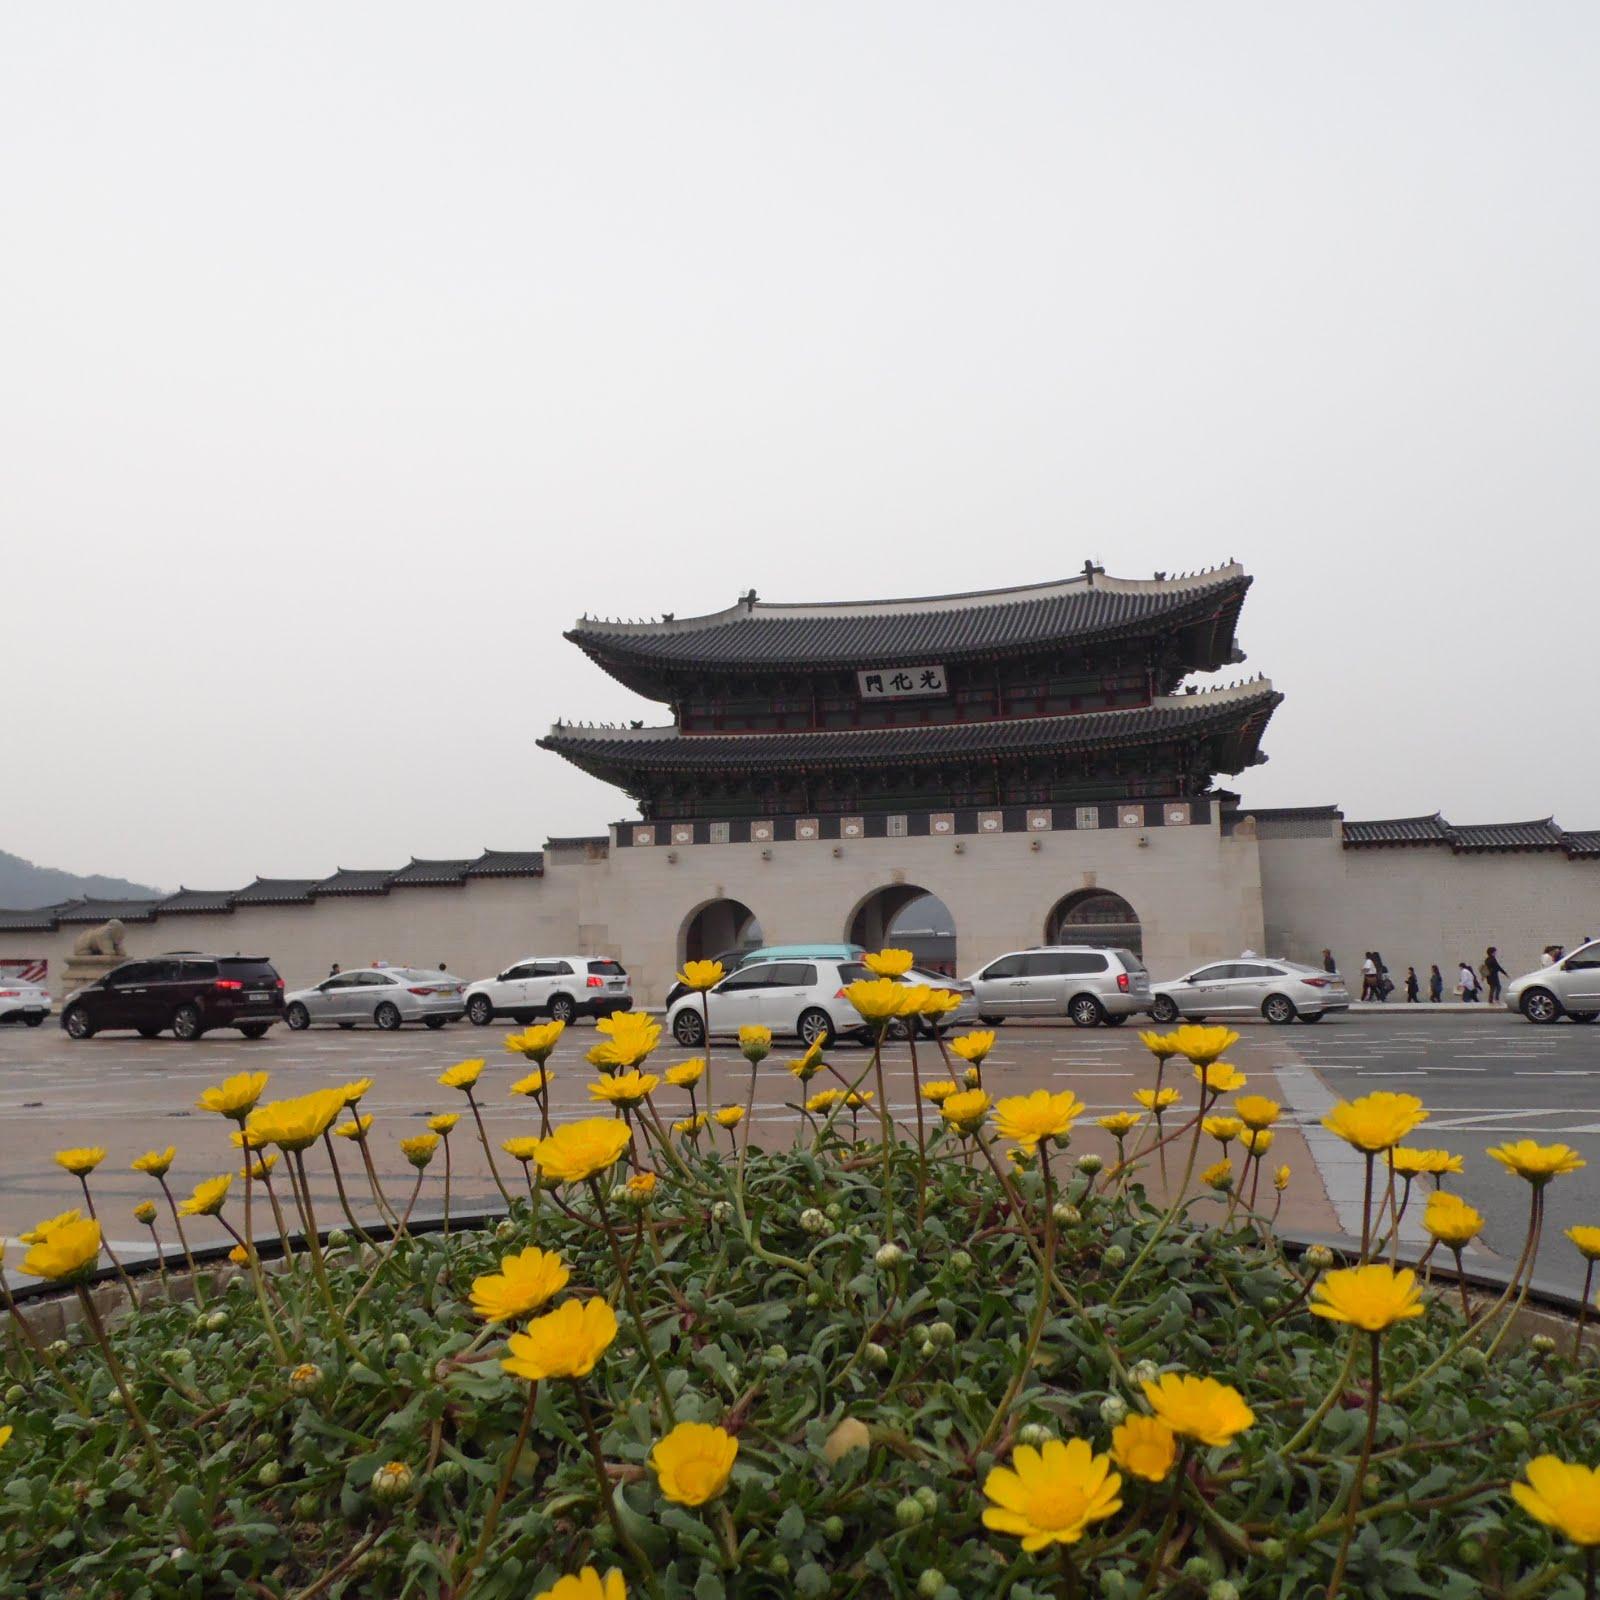 Gwandhwamun Gate